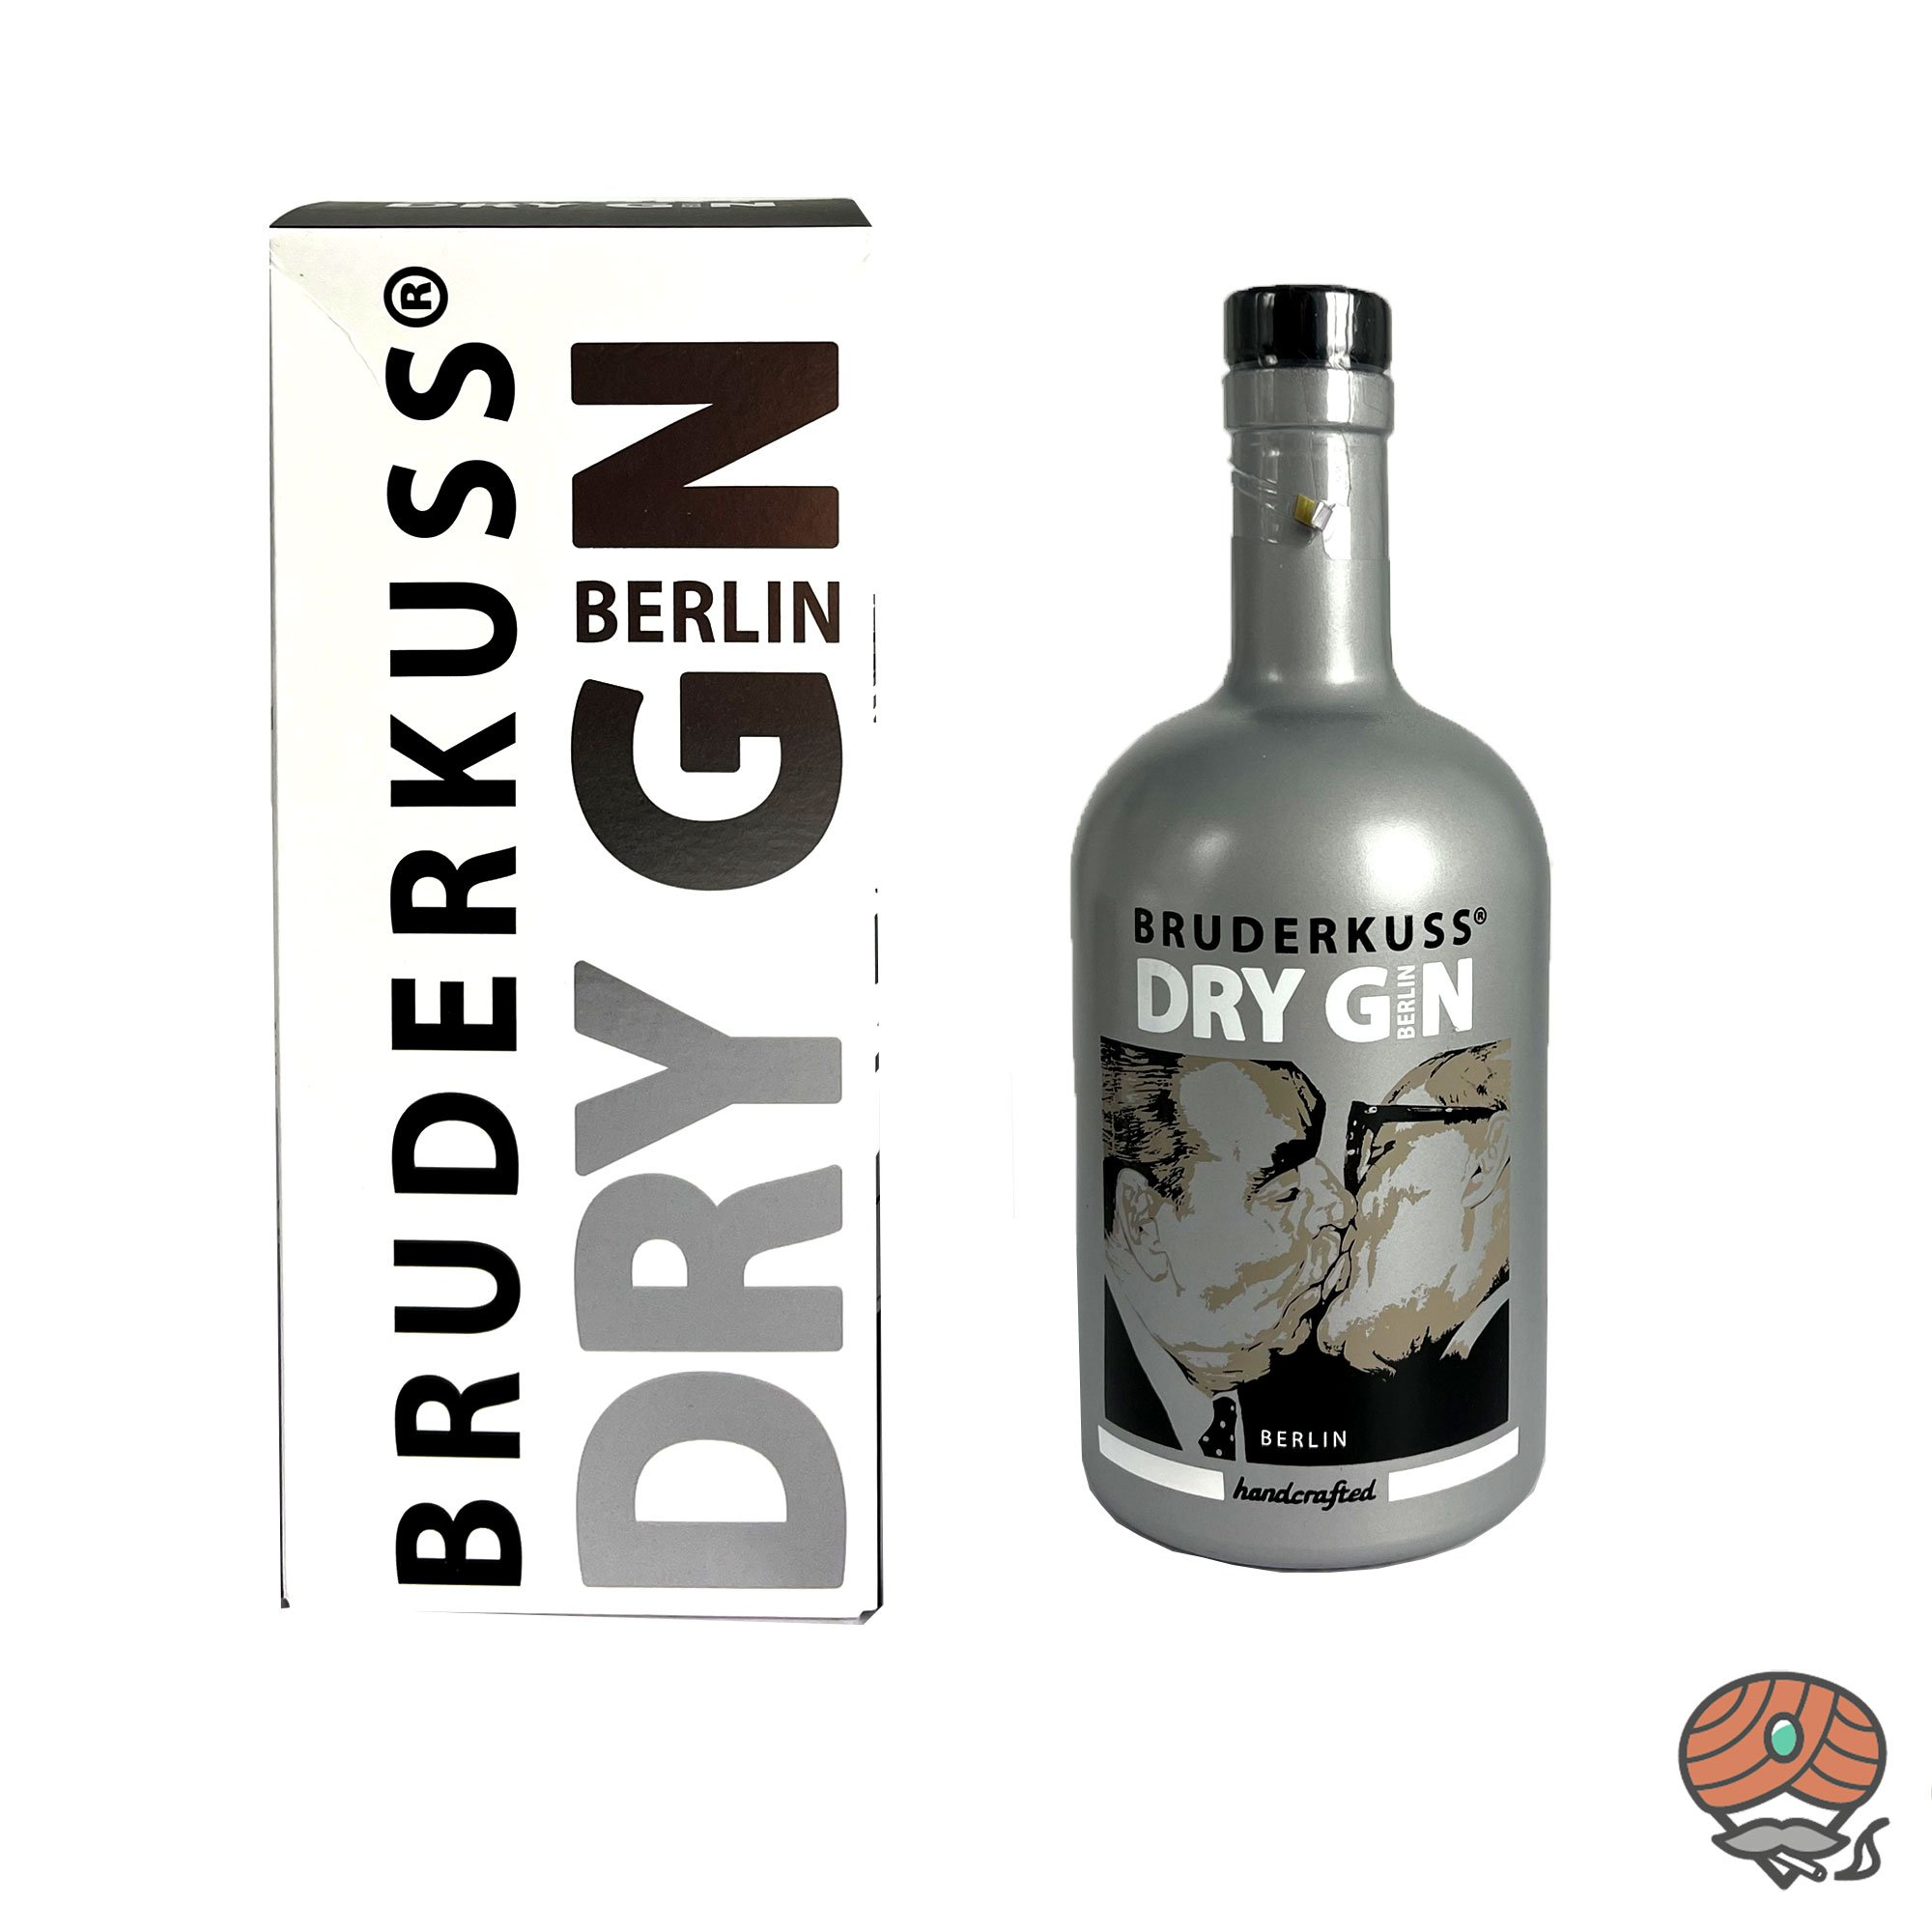 BRUDERKUSS Berliner Luxery Dry Gin 0,5l, alc. 46 Vol.-%